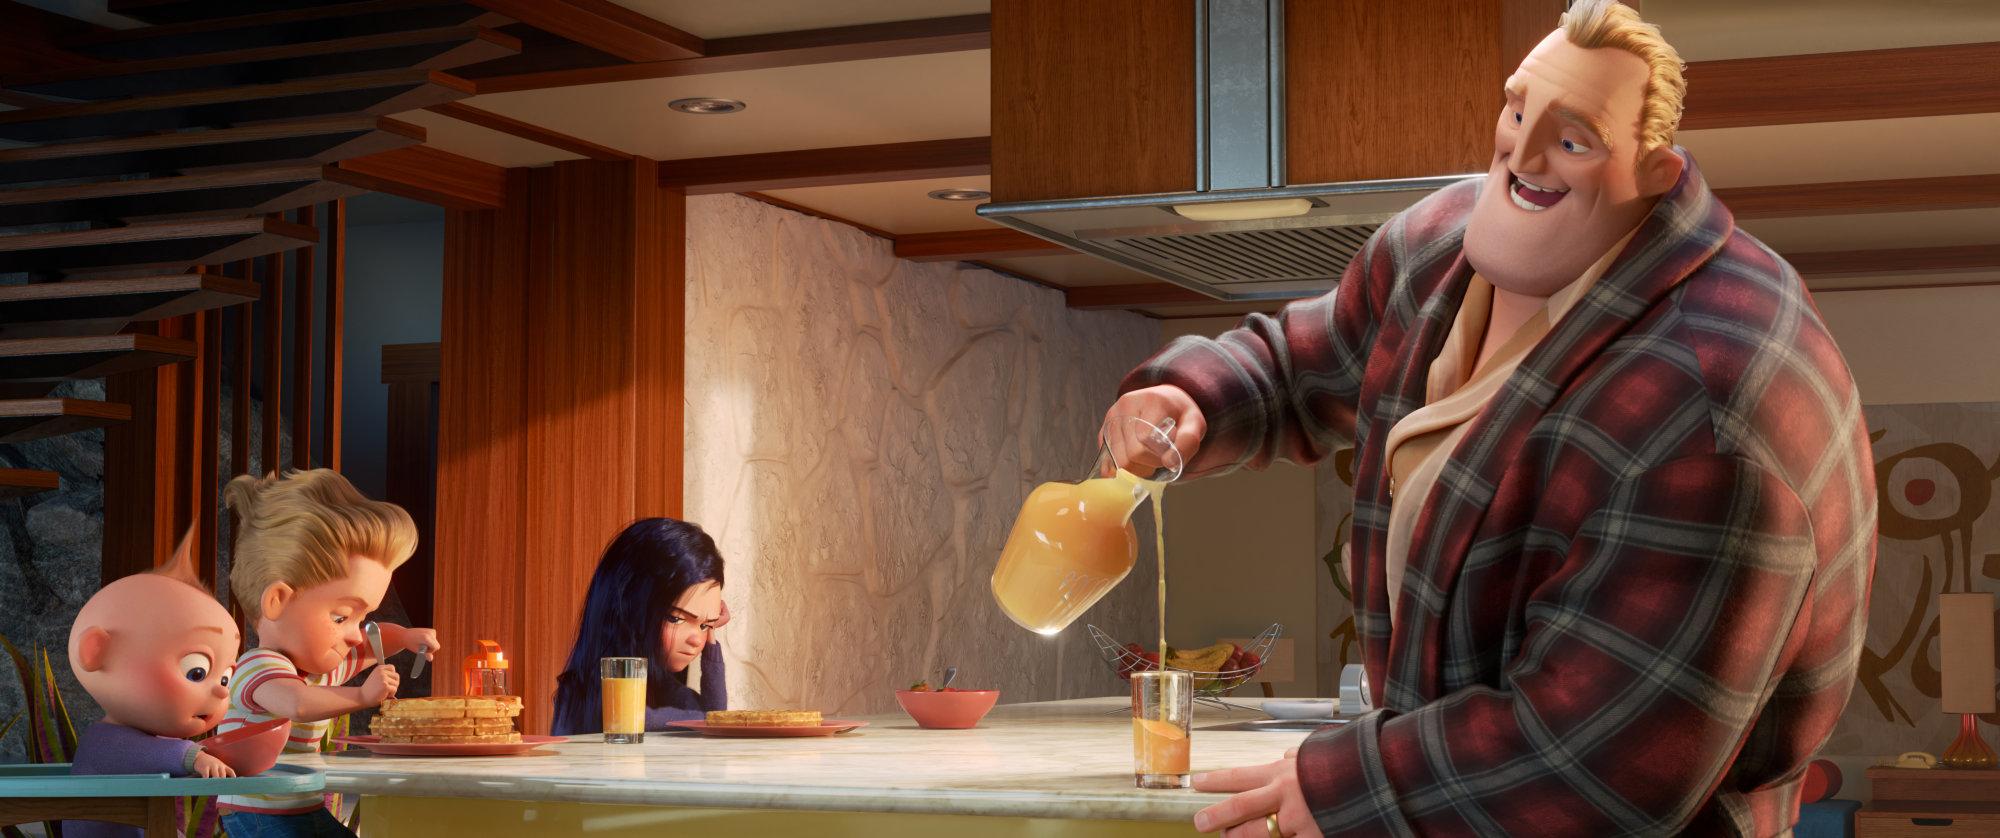 «Incredibles 2»